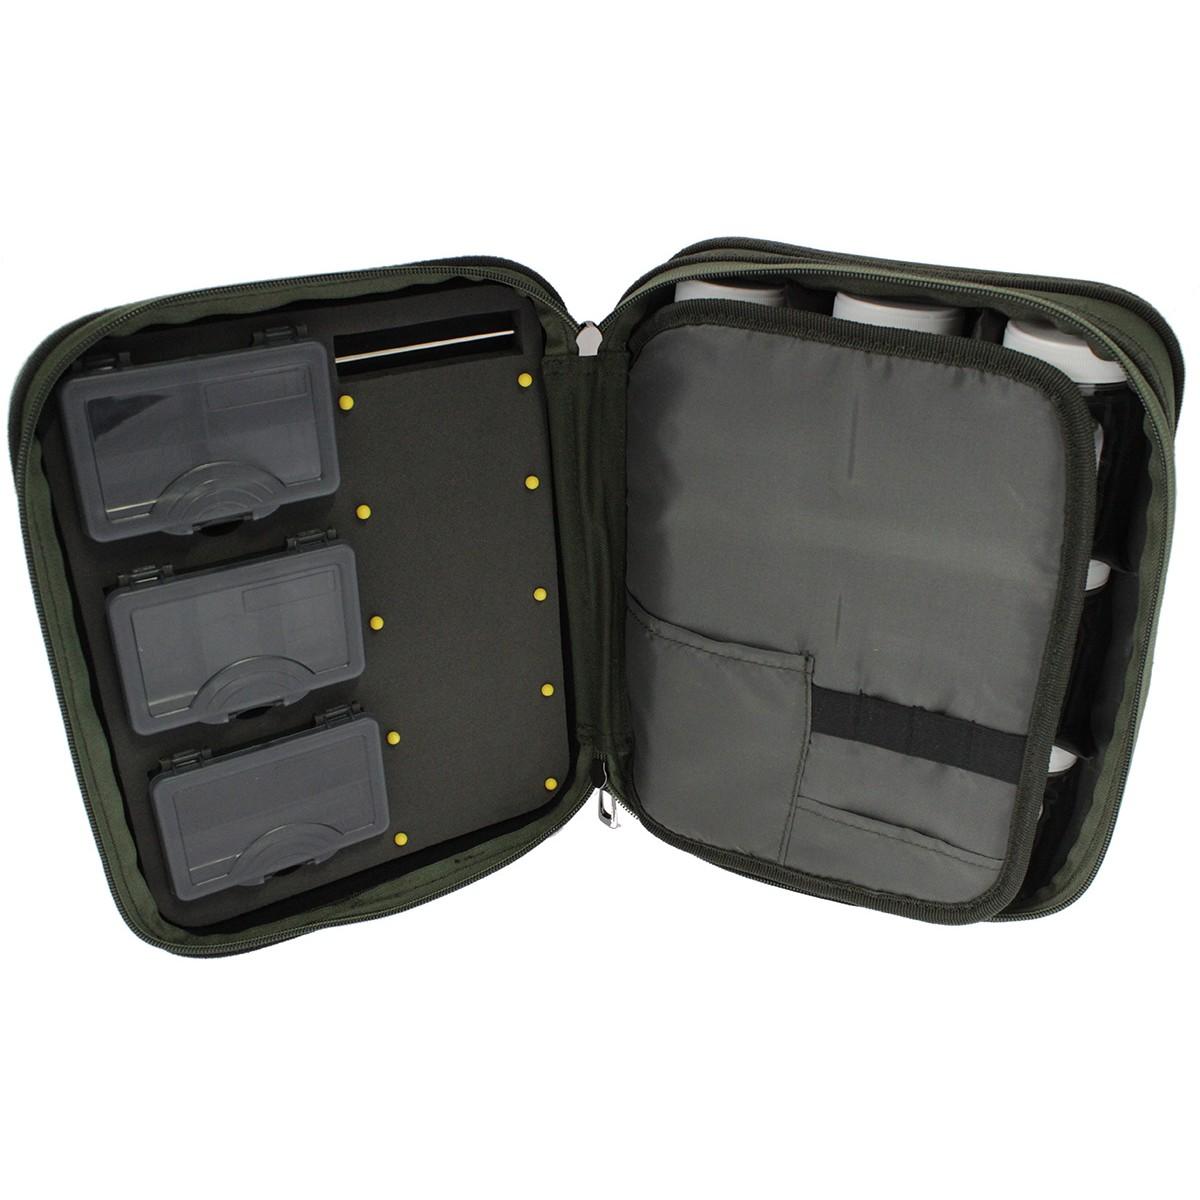 Carp Pro Tackle Bag 3 Boxes + 9 Bottles